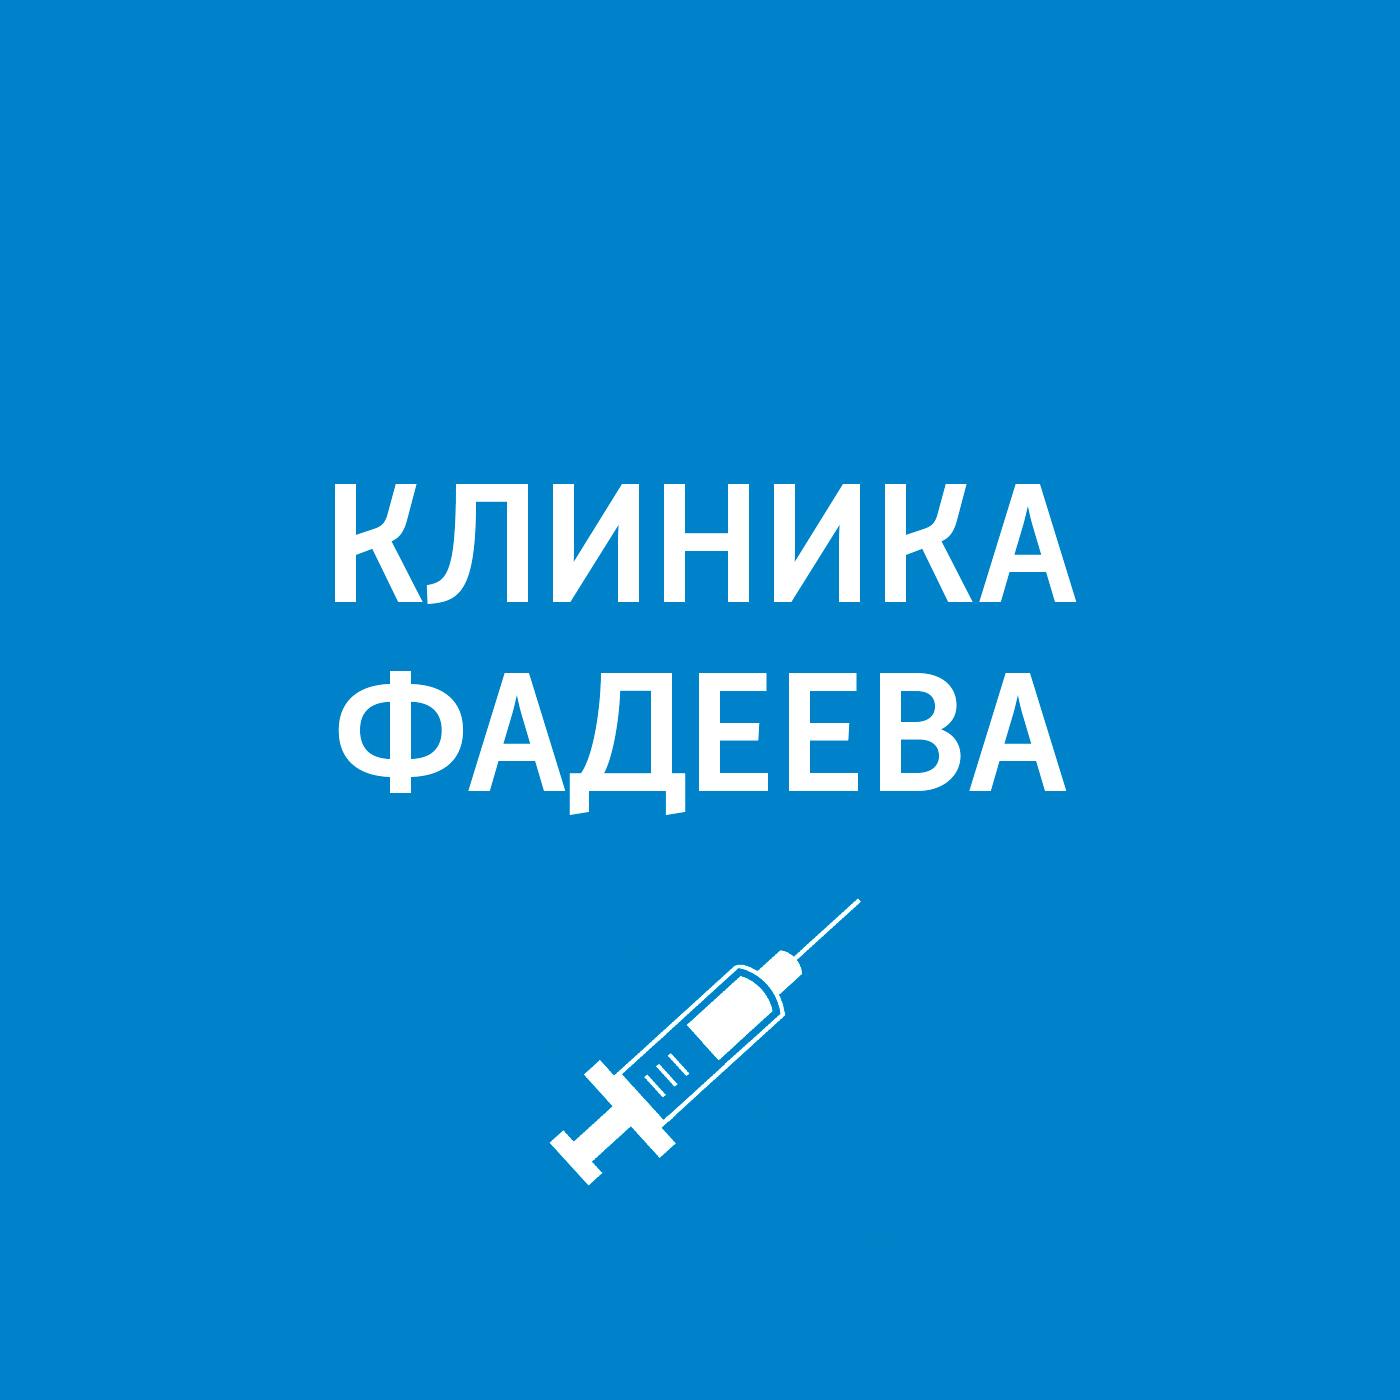 Пётр Фадеев Трихолог цена 2017